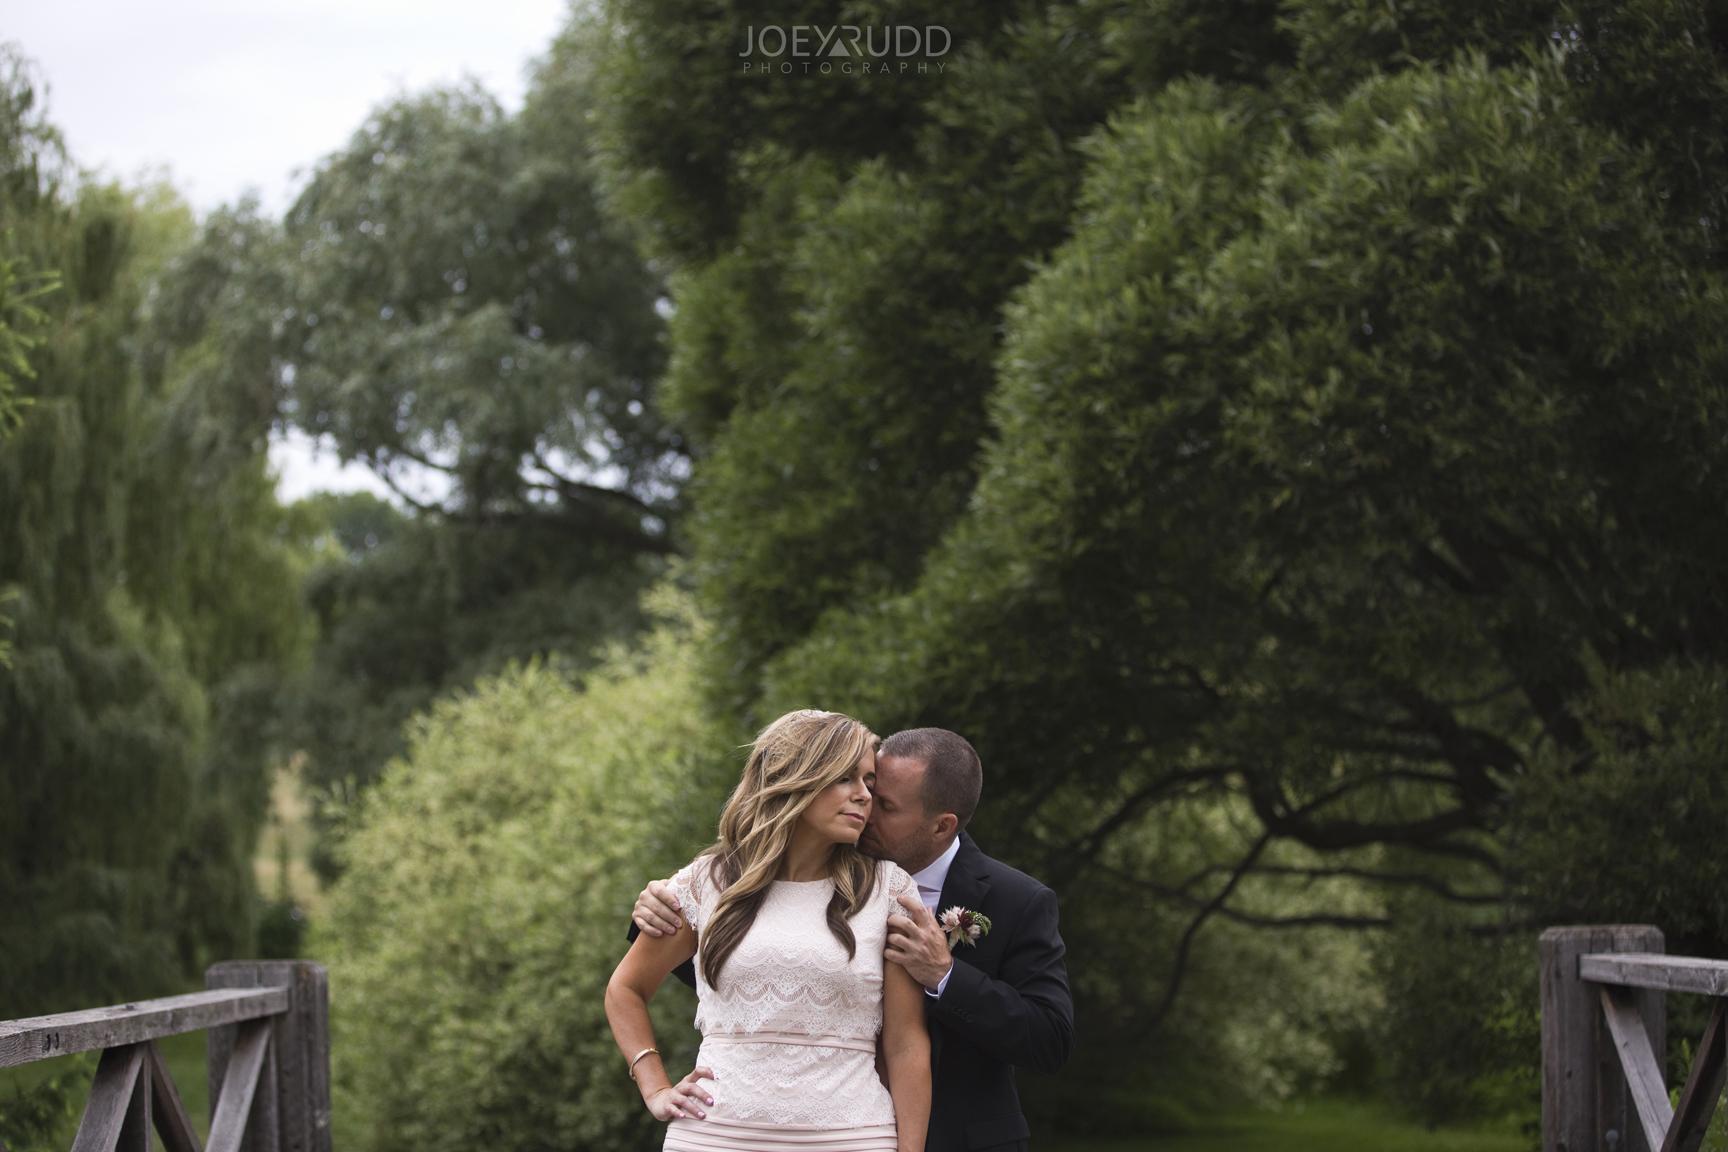 Elopement Wedding by Ottawa Wedding Photographer Joey Rudd Photography Arboretum Best Bridge